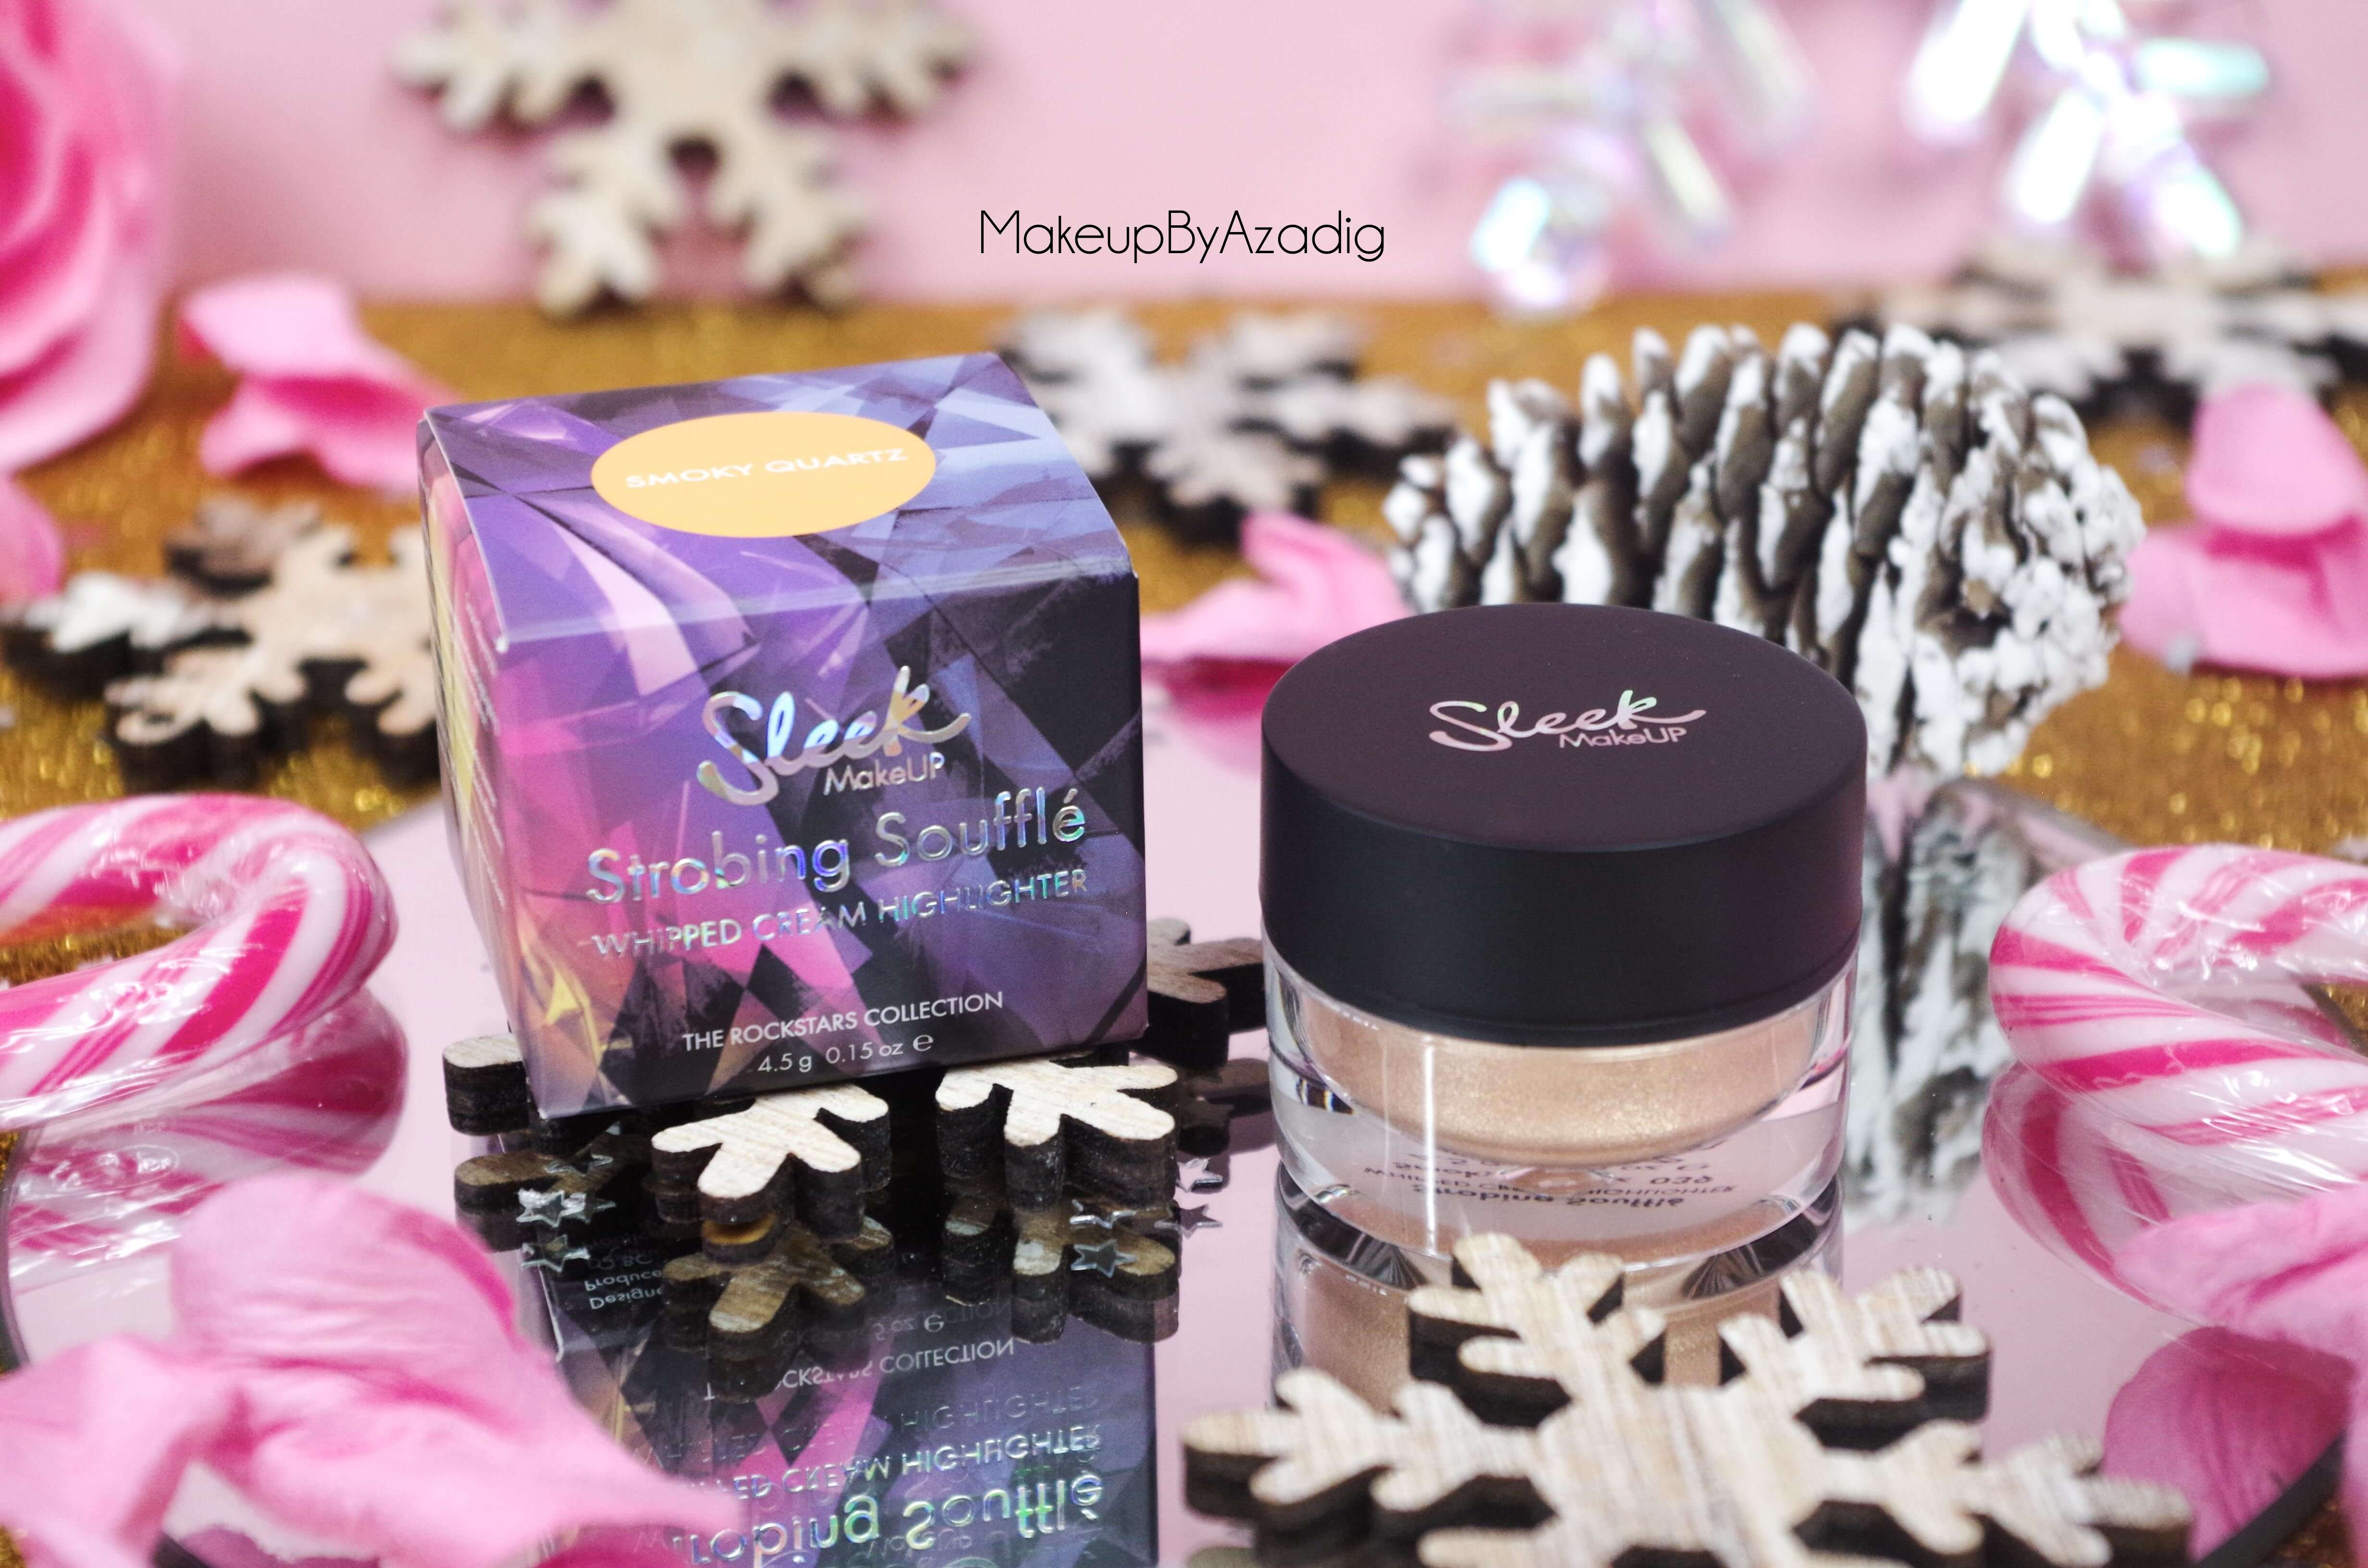 highlighter-sleek-makeup-strobing-souffle-smoky-quartz-sephora-swatch-makeupbyazadig-avis-sananas